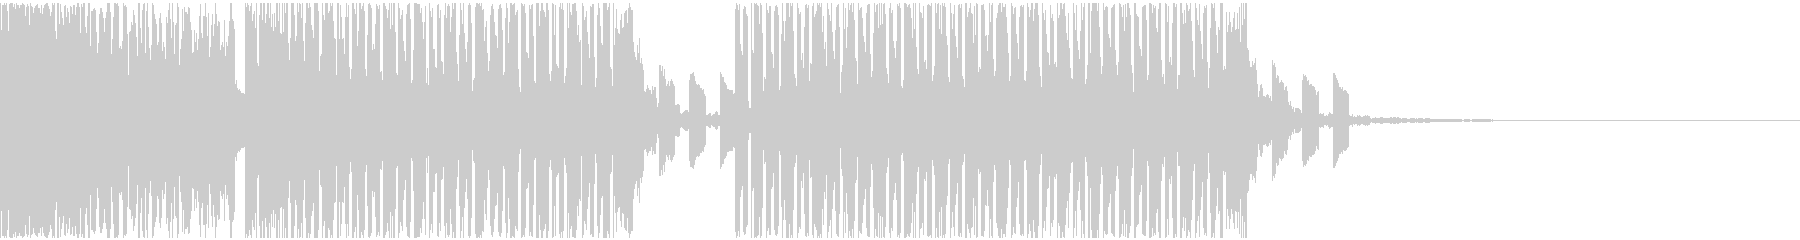 【EDM】クラブダンスミュージック3の未再生の波形